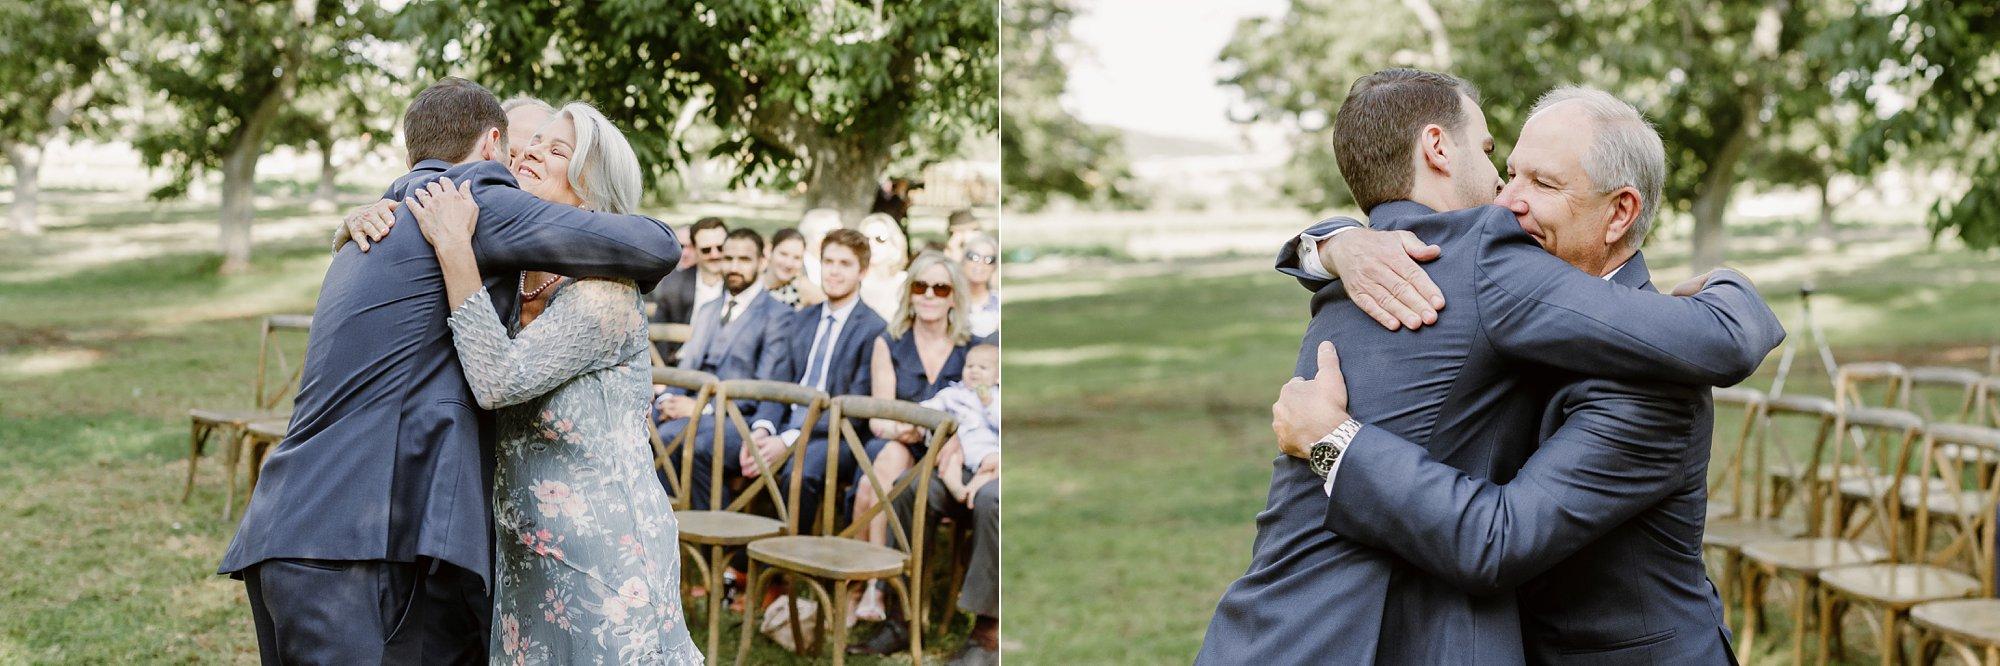 Walnut Grove Moorpark California Wedding_0014.jpg